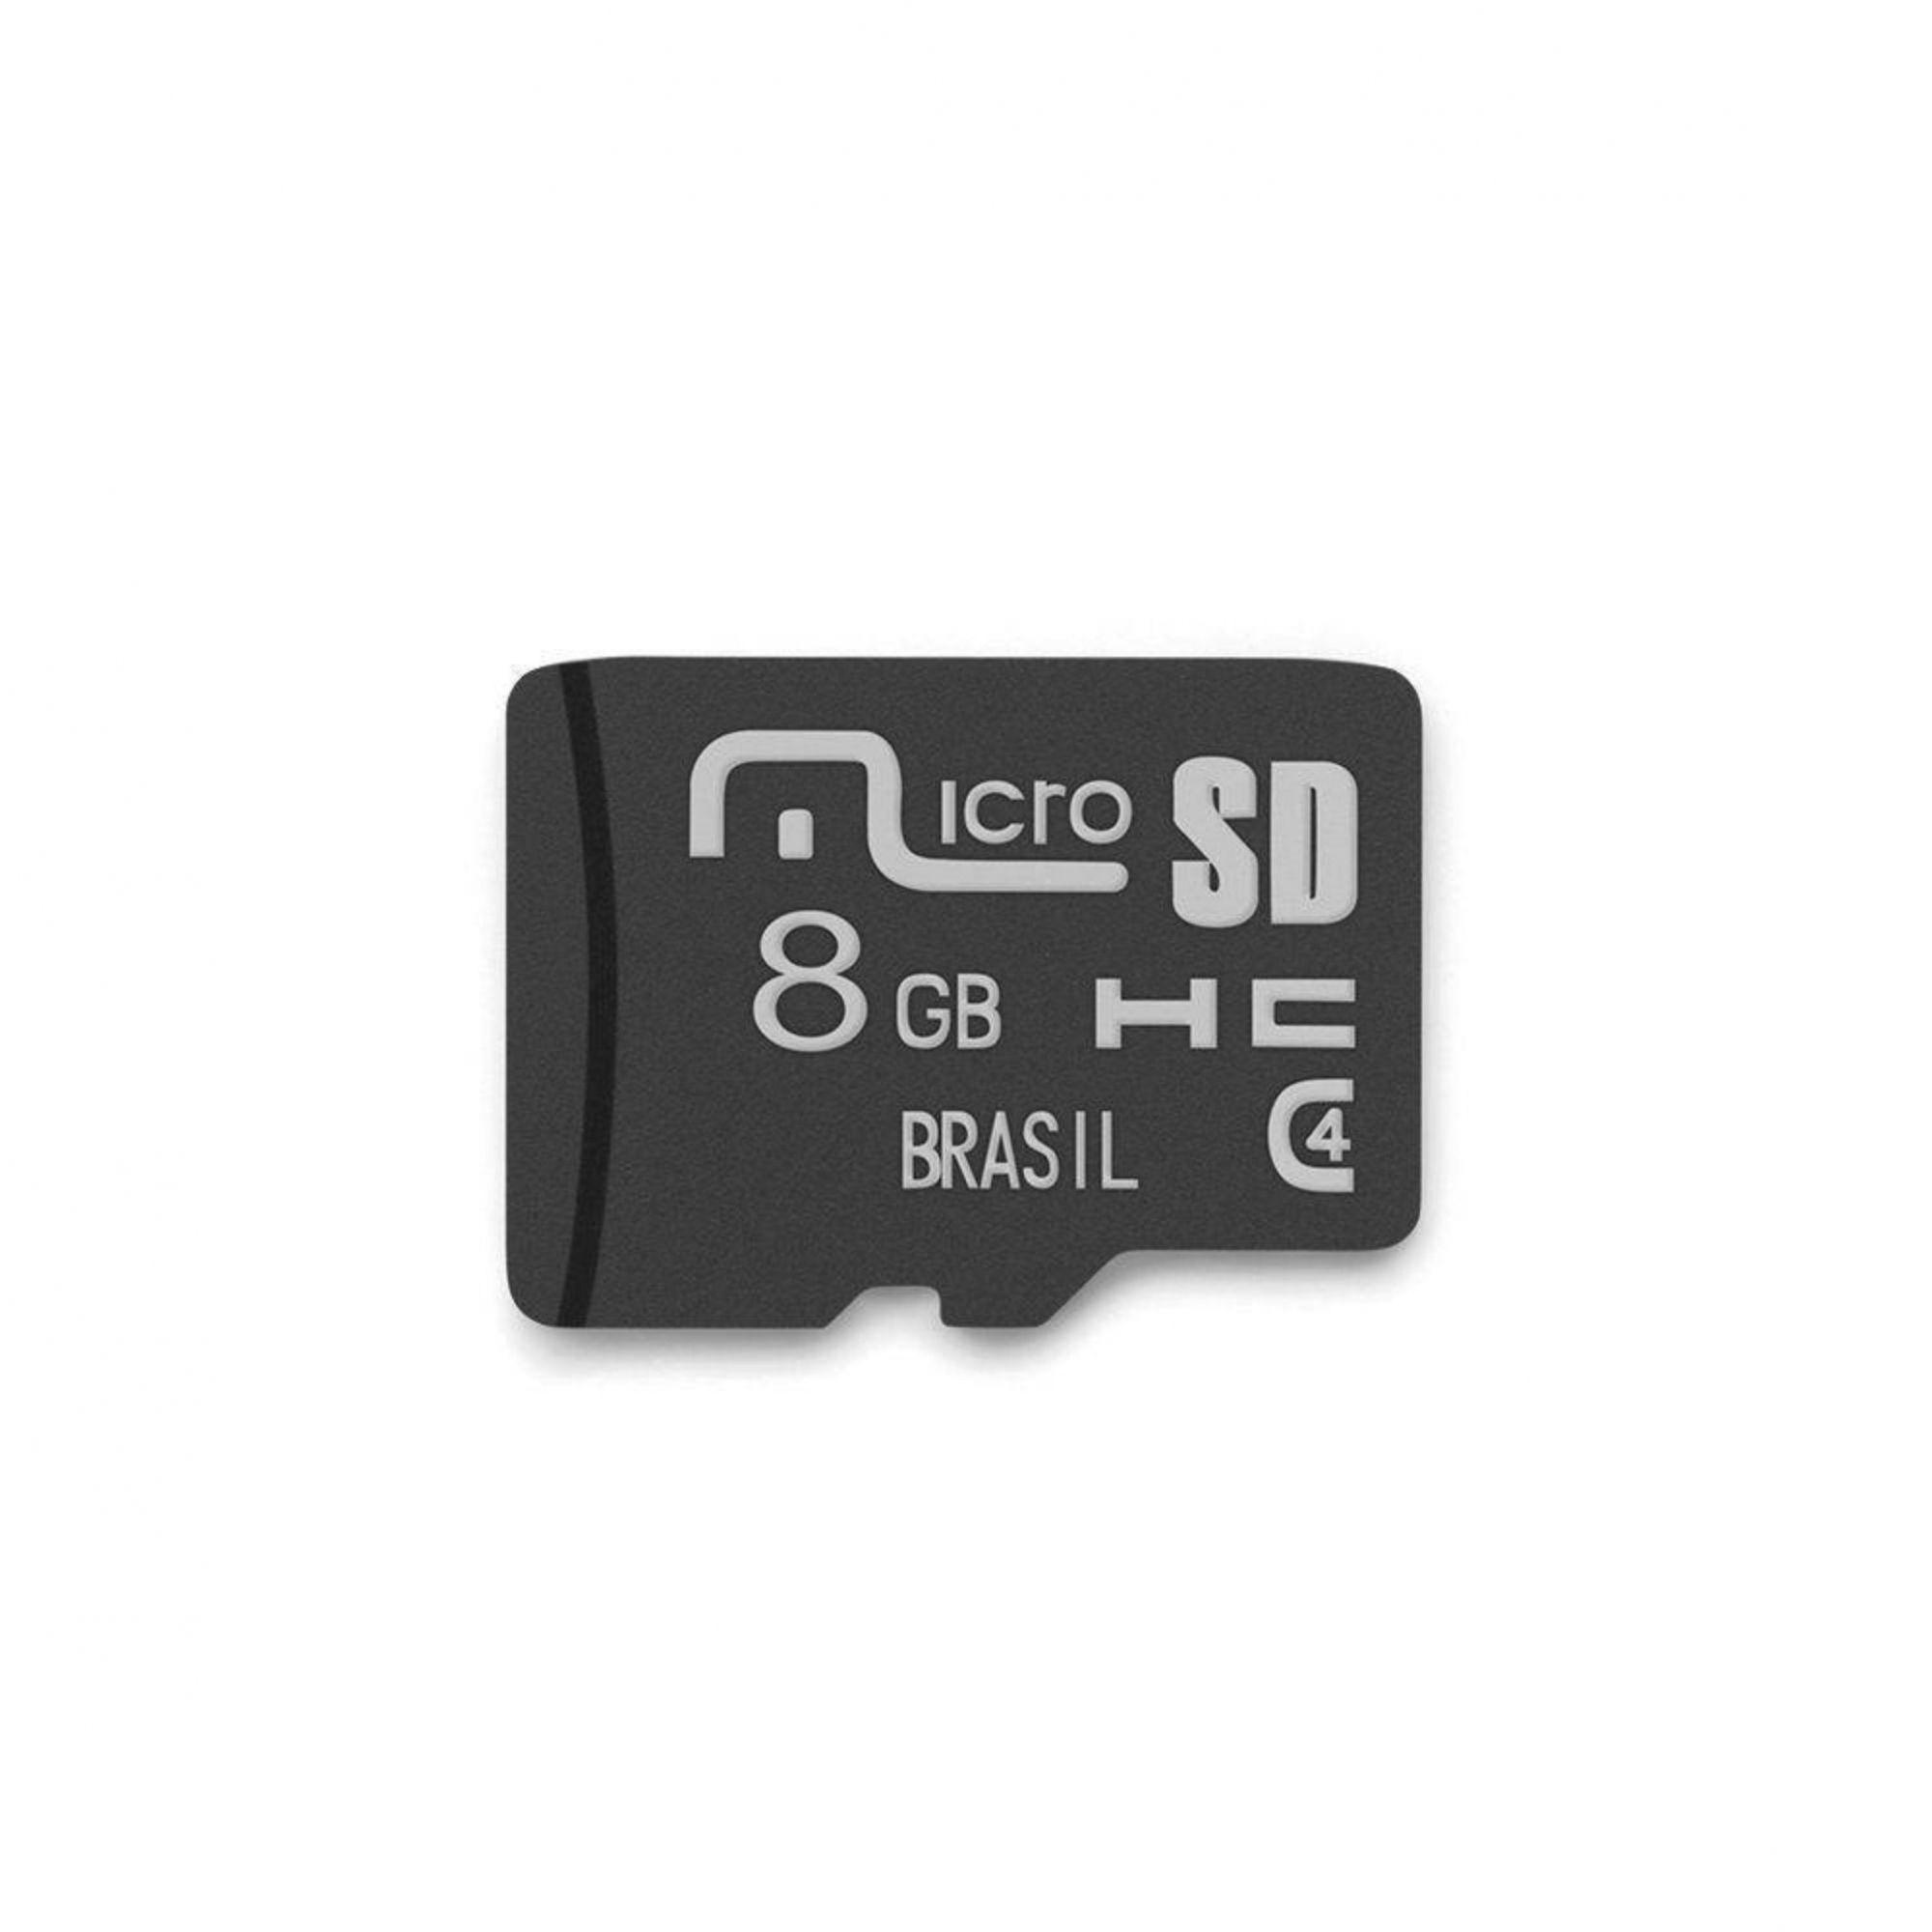 CARTÃO MICROSDHC MULTILASER 8GB CL 4